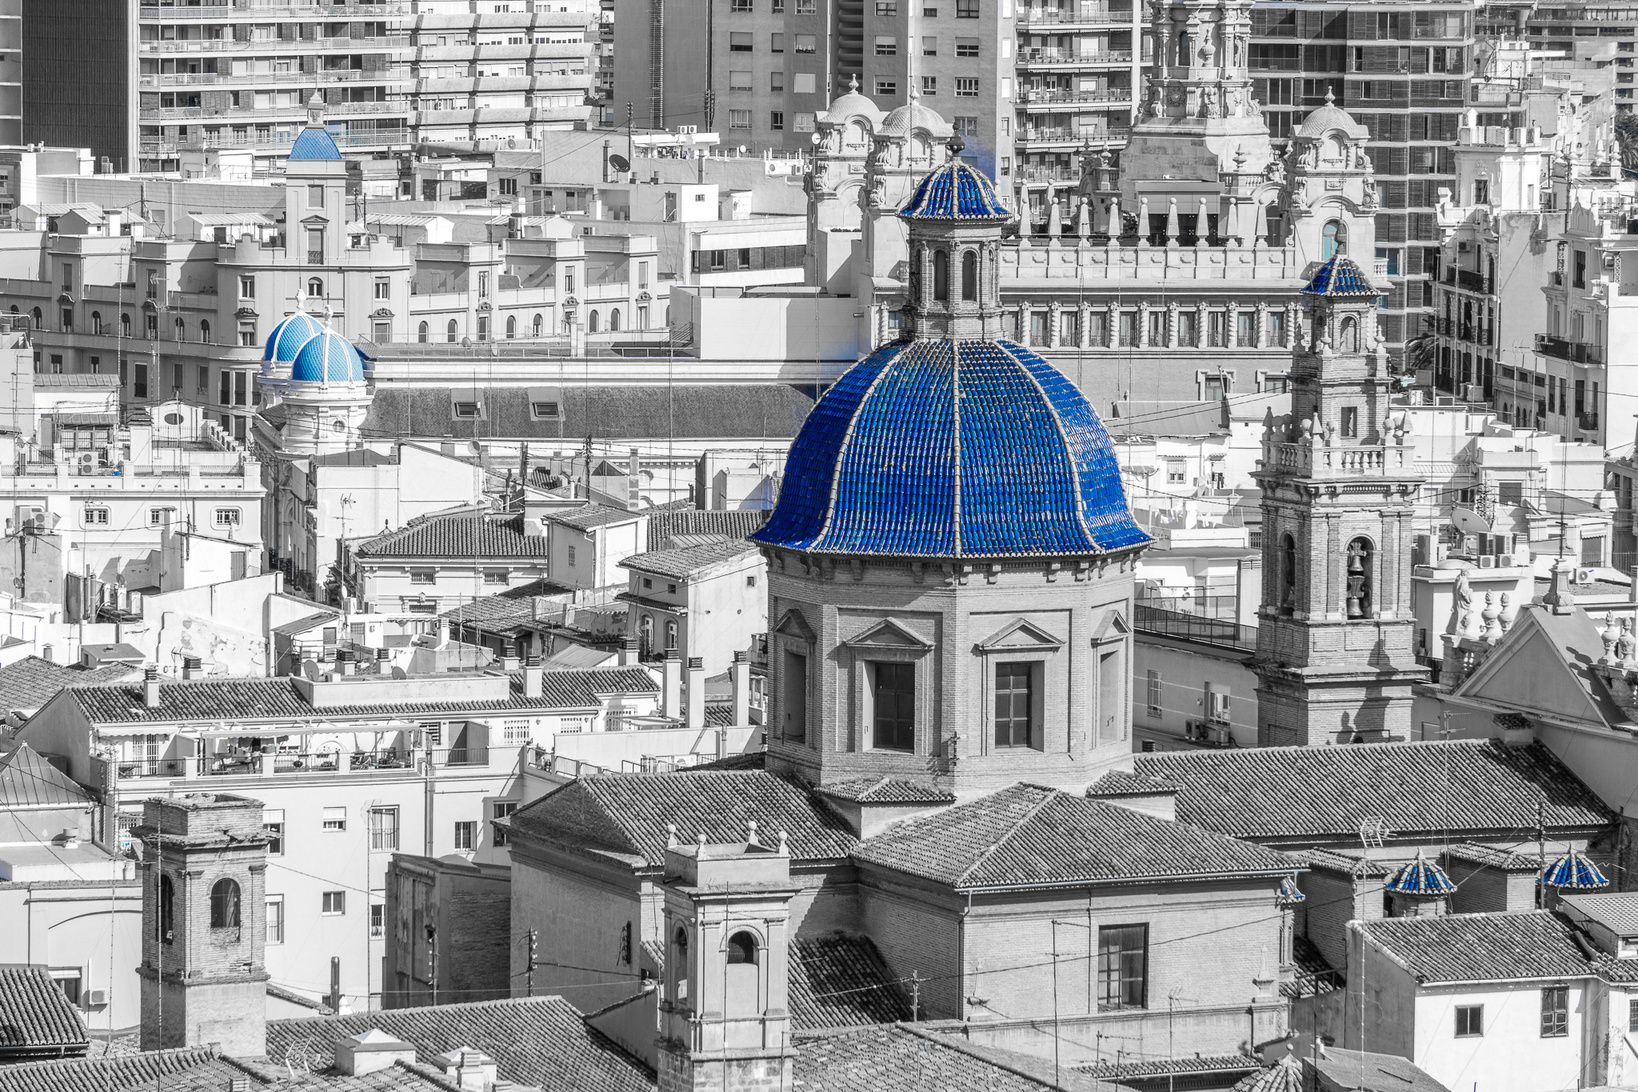 Valencia Spain  #Valencia #Spain #ArchitecturePhotography #Architecture #ArchitectureLovers #ig_valencia #insta_bw #monochrome #sonyalpha #Sony #SonyImages #sonya6000 #igtravel #igworldclub #instamoments #instapassport #instatravel #postcardfromtheworld #theglobewanderer #traveladdict #travelgram #TopValenciaPhoto #selectivecolor